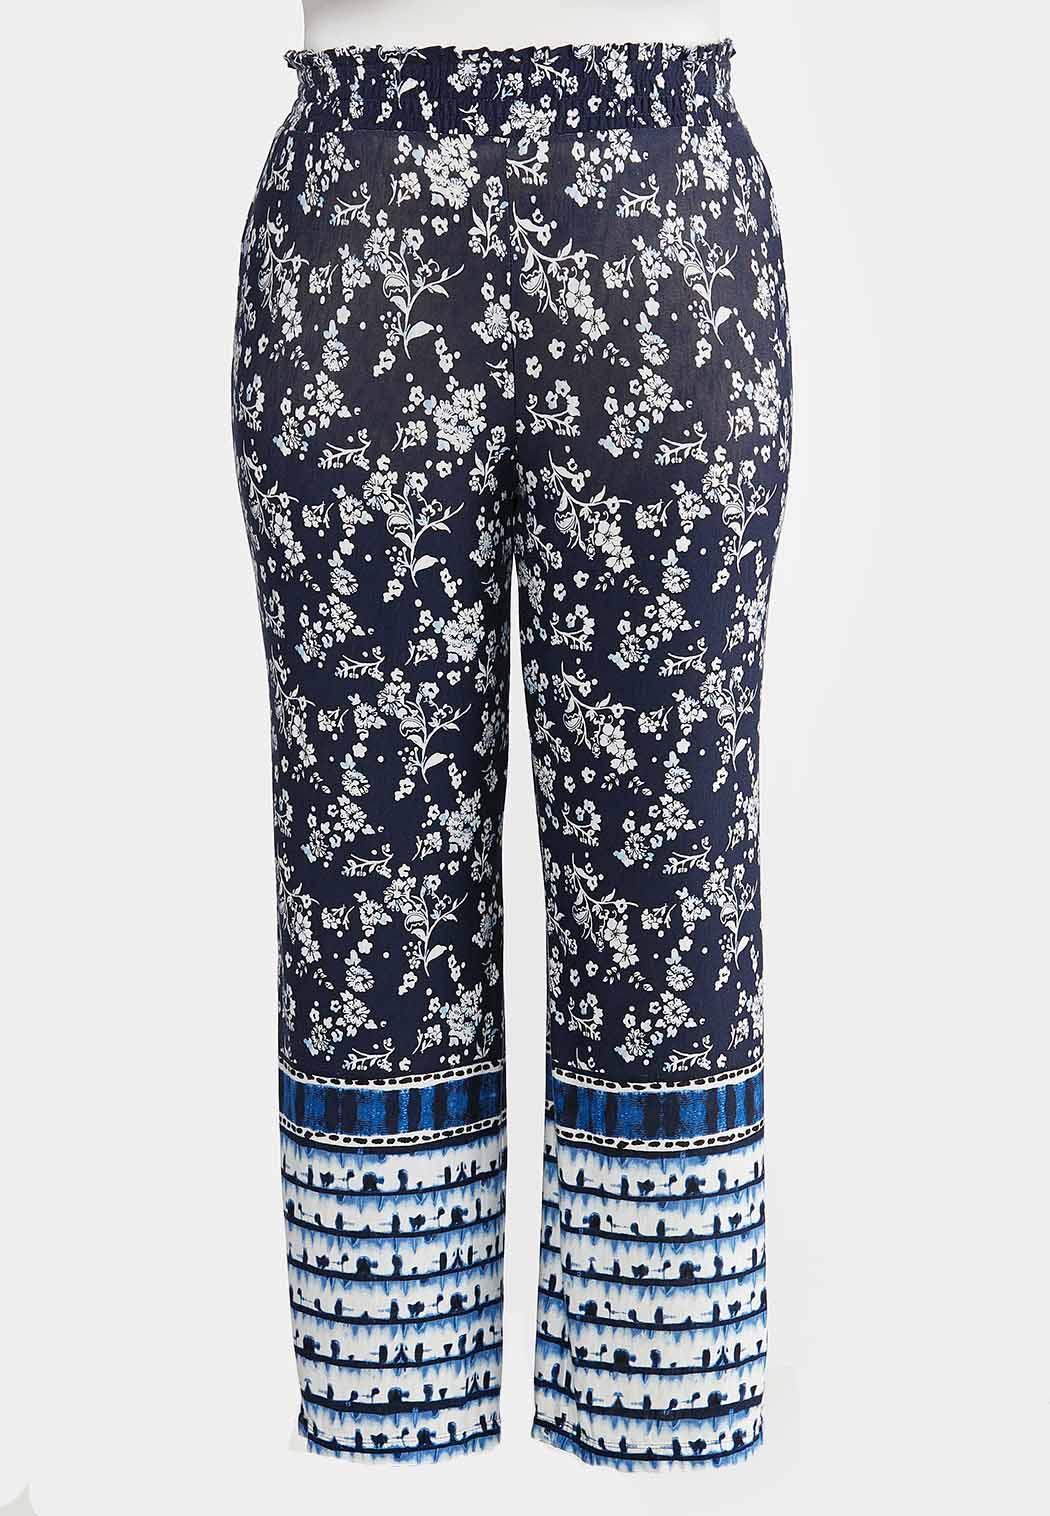 Plus Size Floral Tie Dye Panel Pants